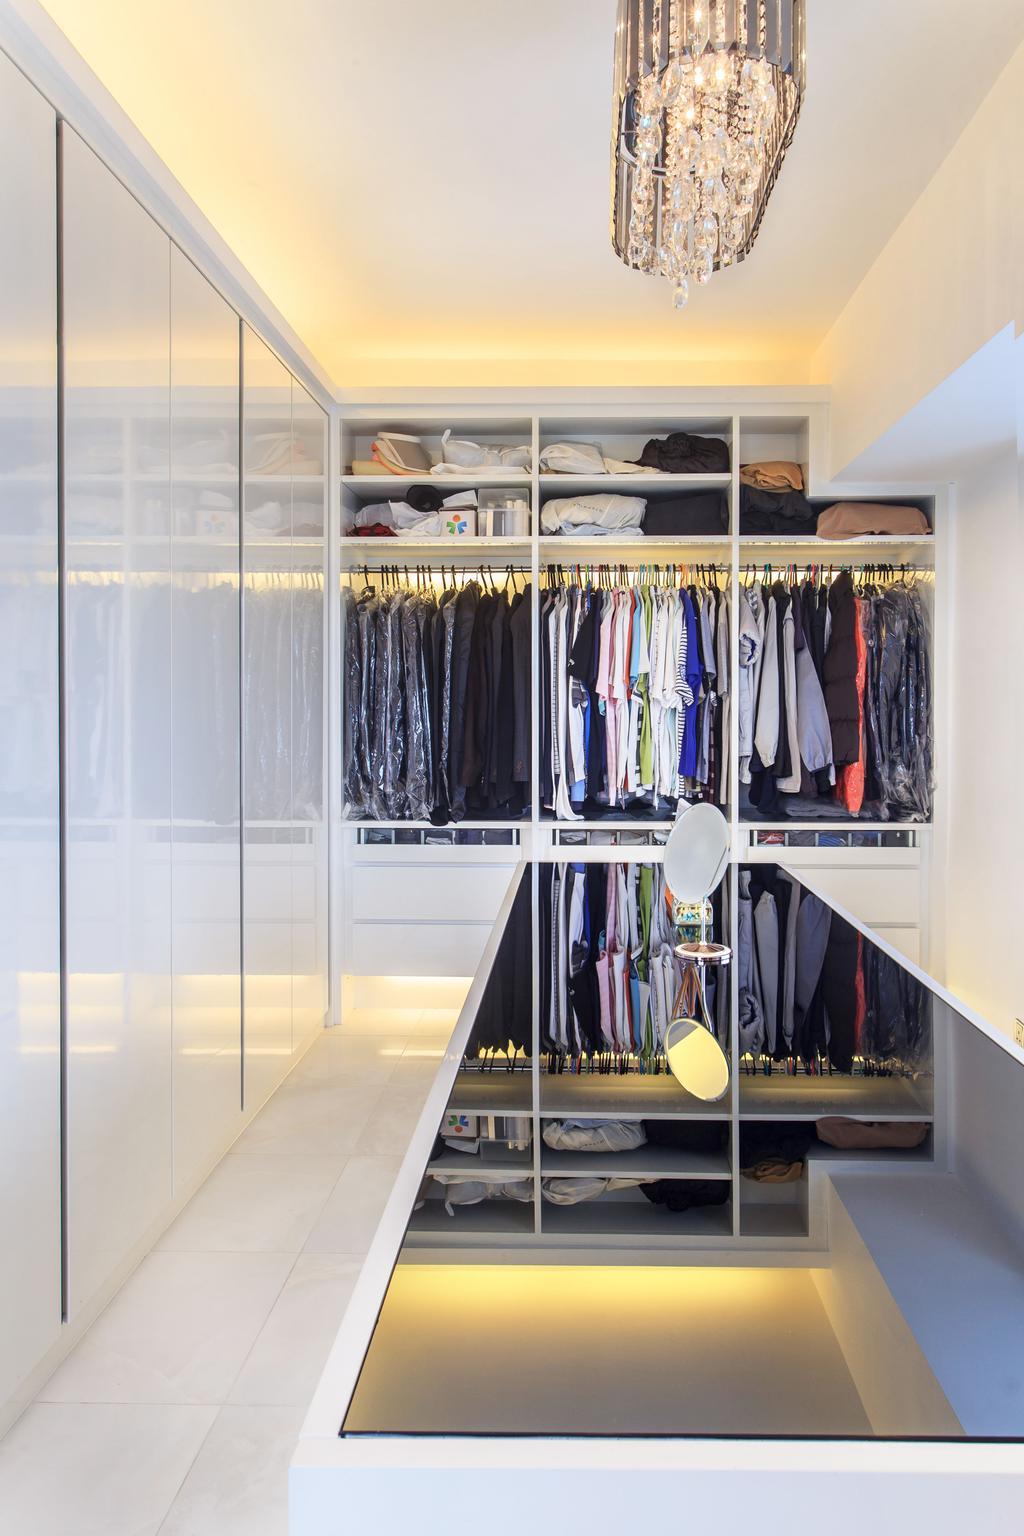 私家樓, 睡房, 華景山莊, 室內設計師, Homing Interior Design, Closet